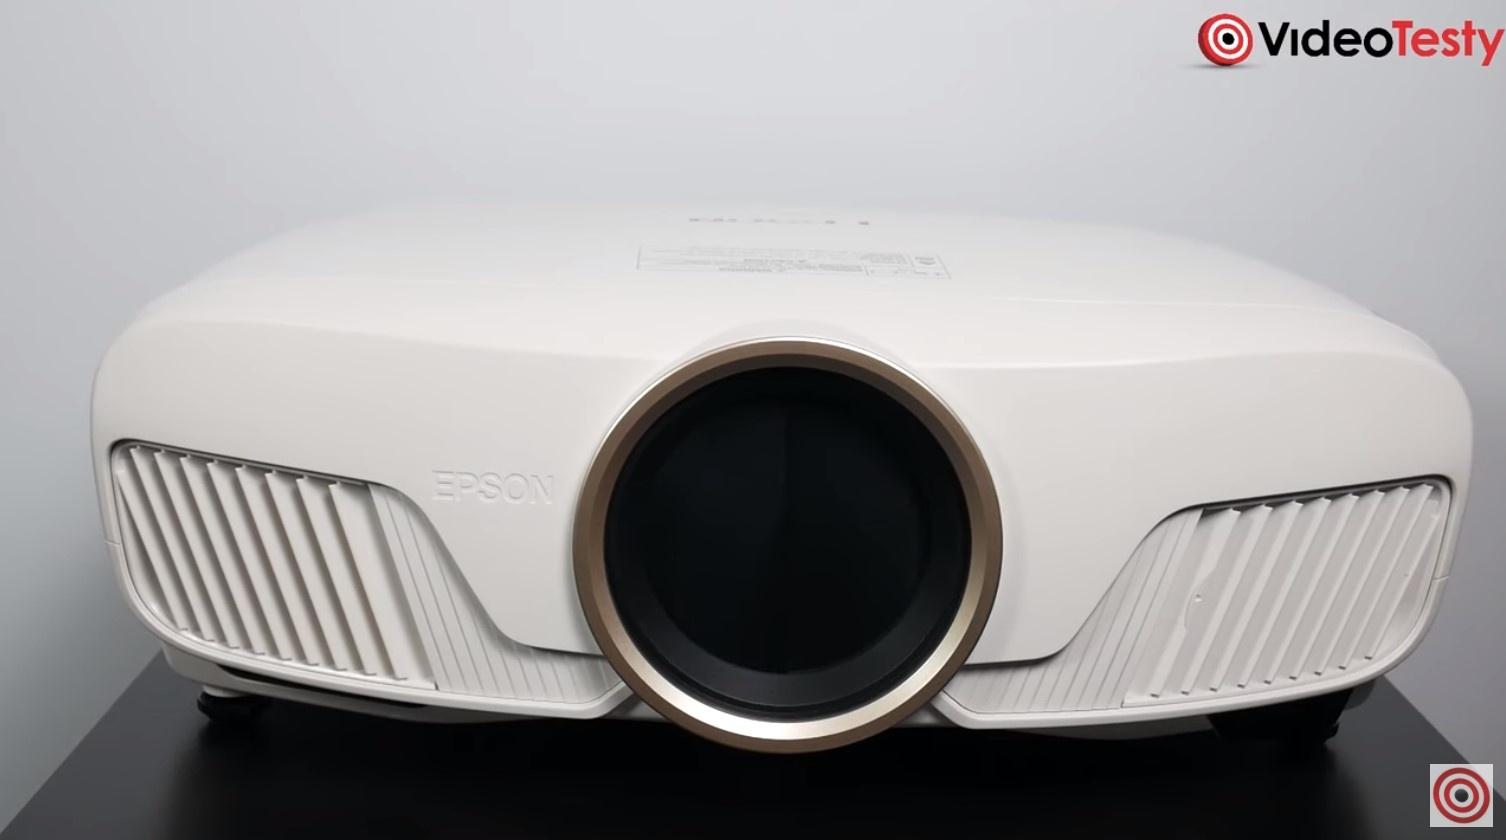 Epson EH-TW7400 duża obudowa projektora 3LCD